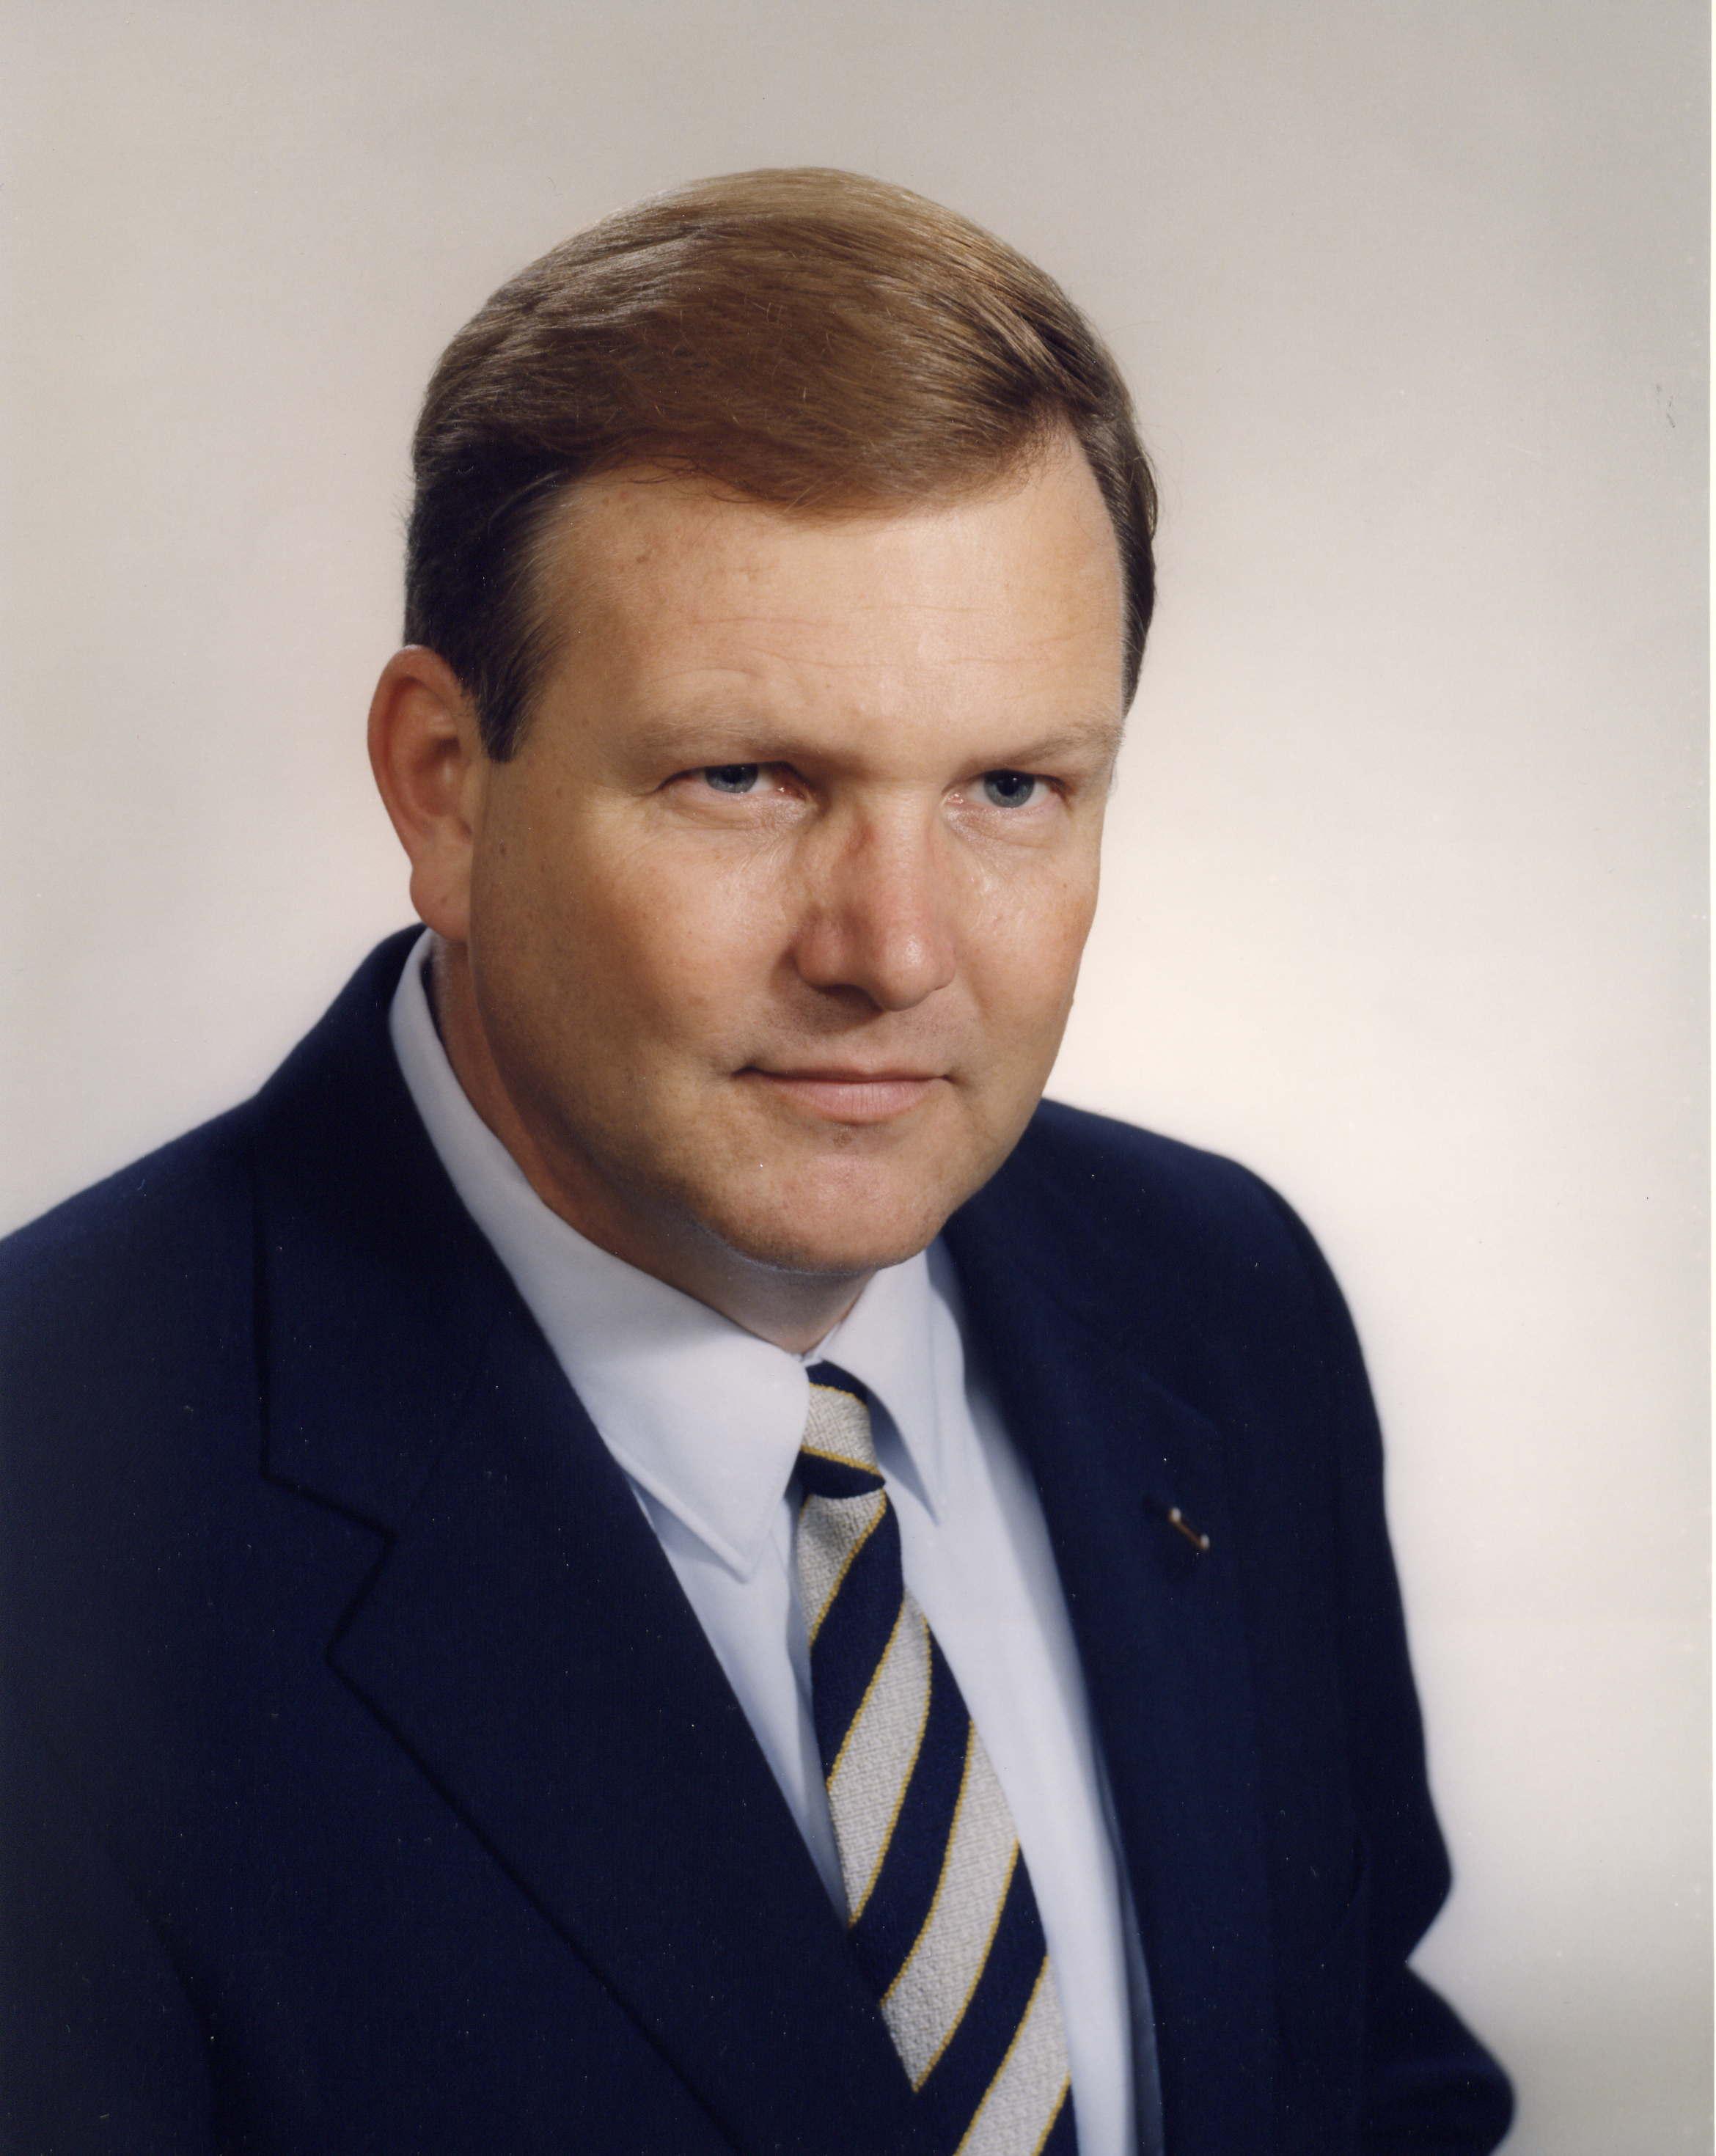 Paul Craig Roberts: biography, education, books 13